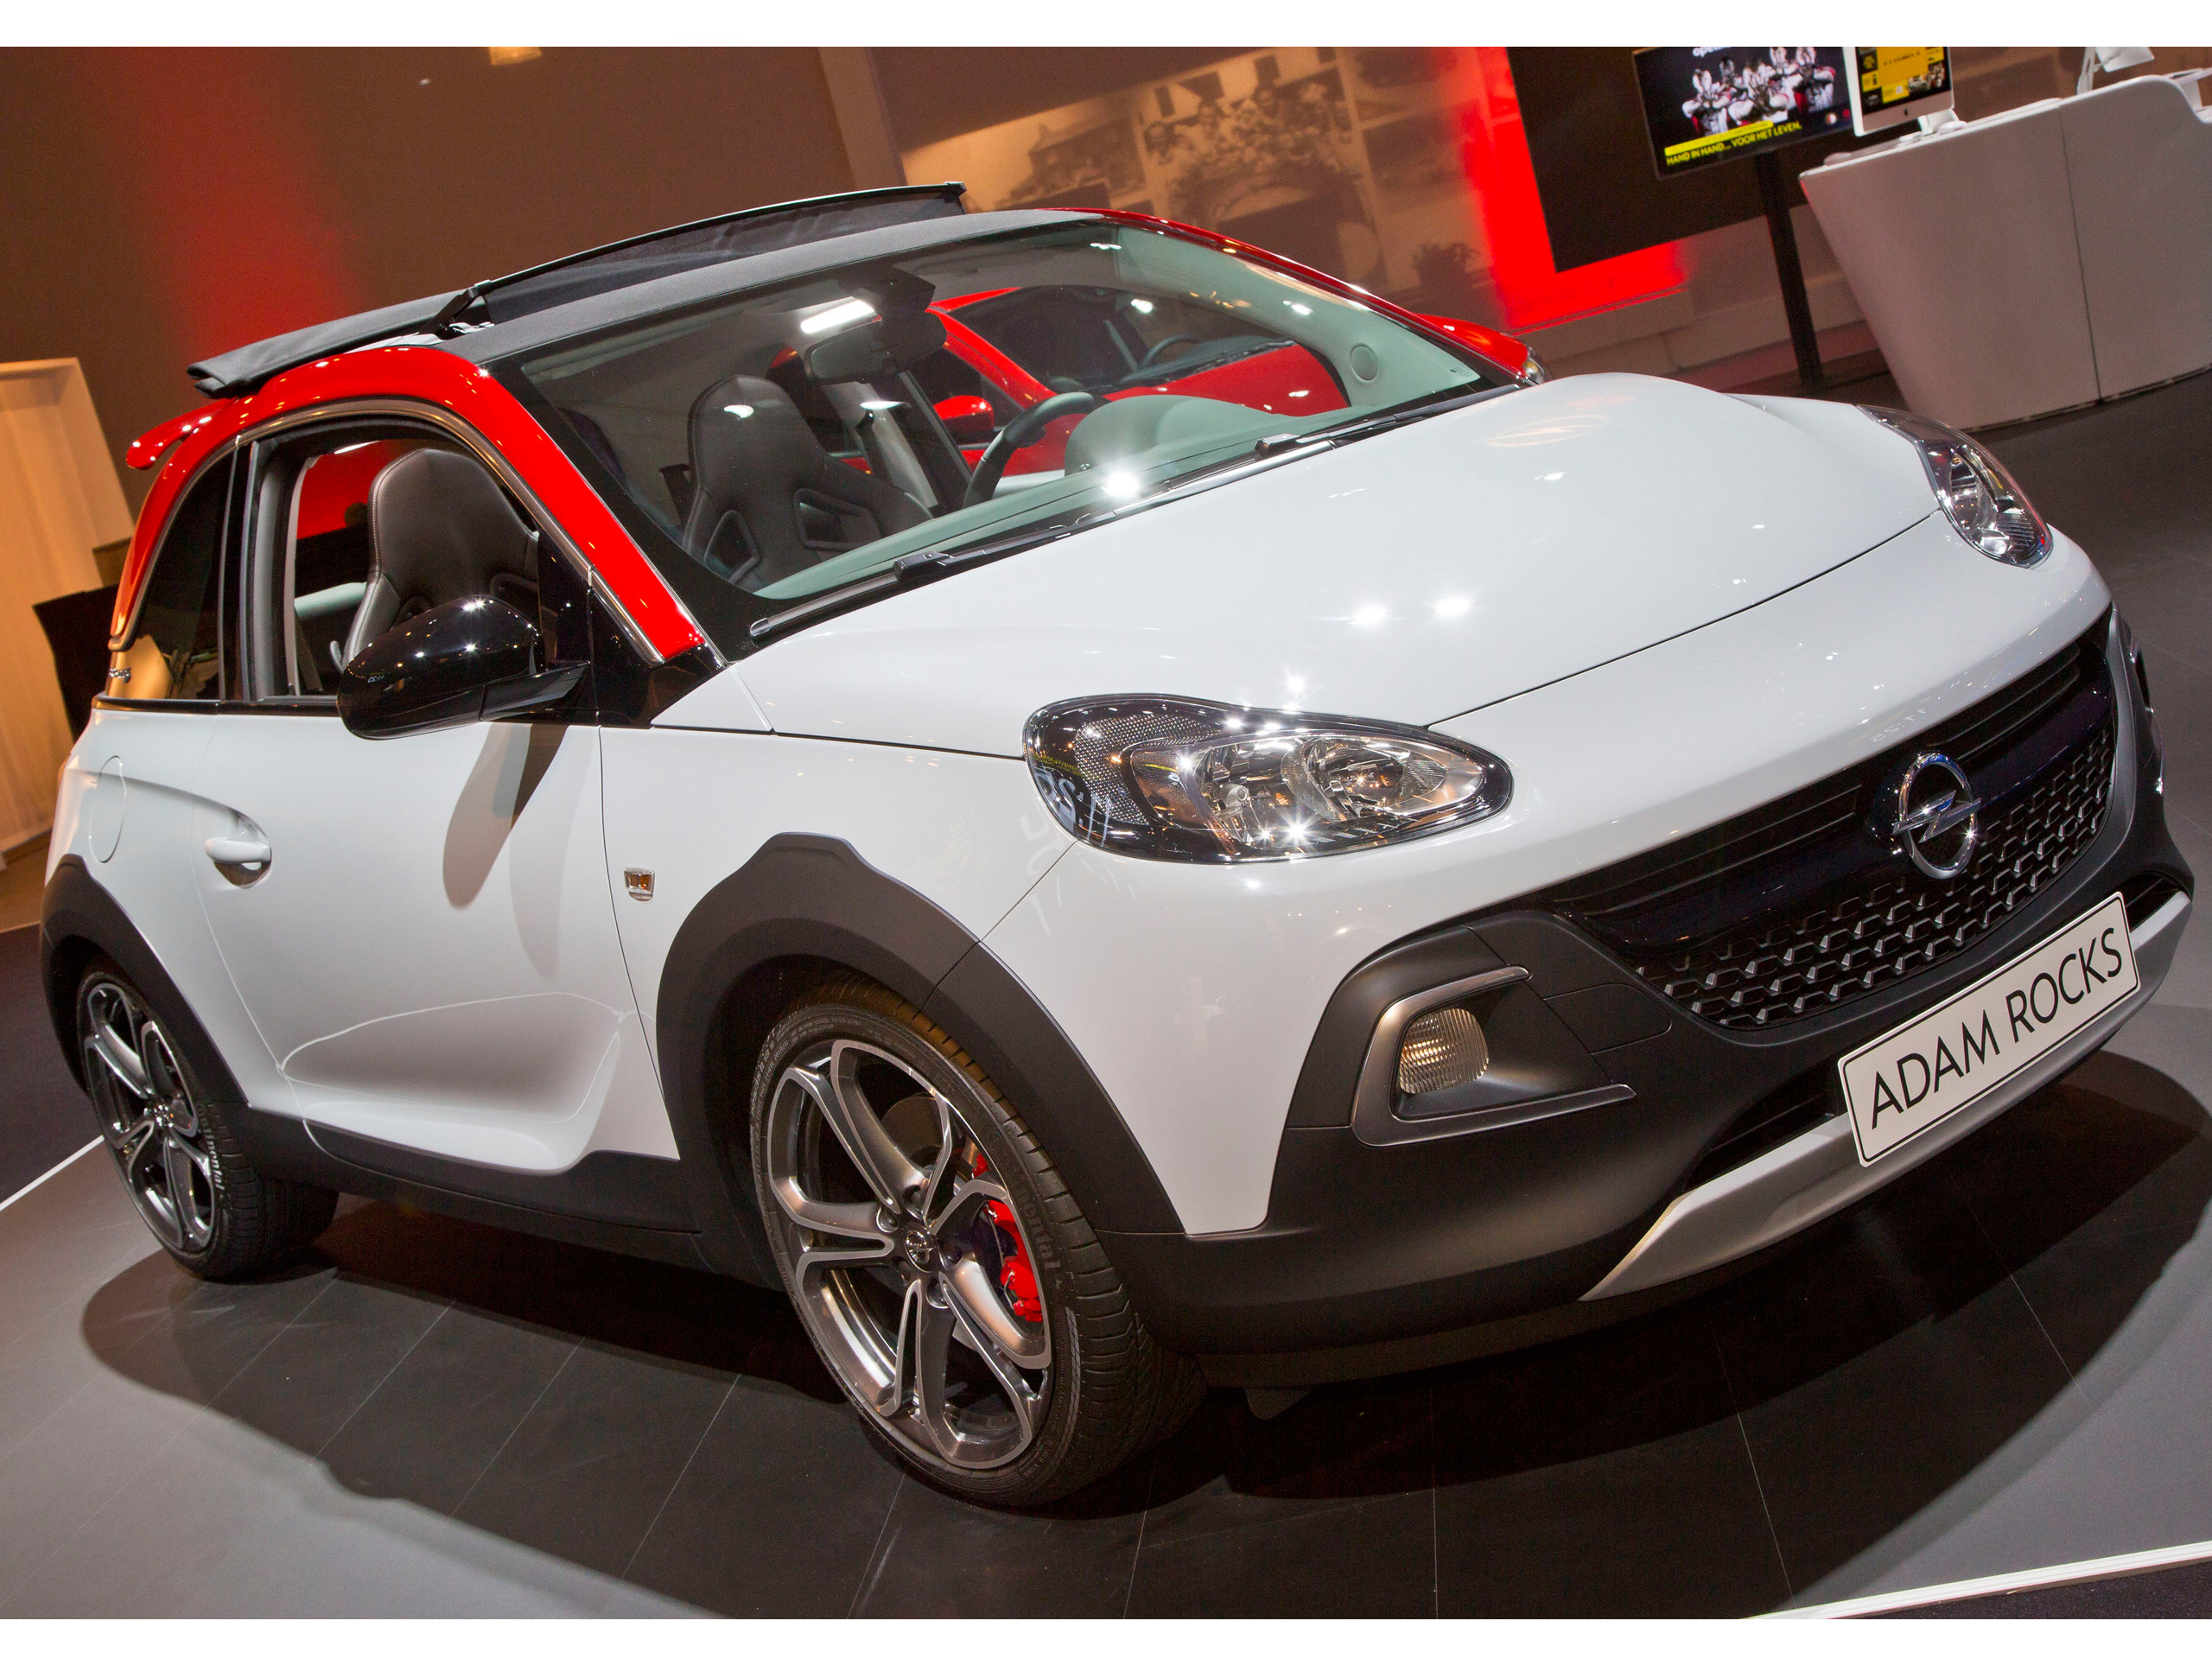 2020 Opel Adam Rocks Redesign